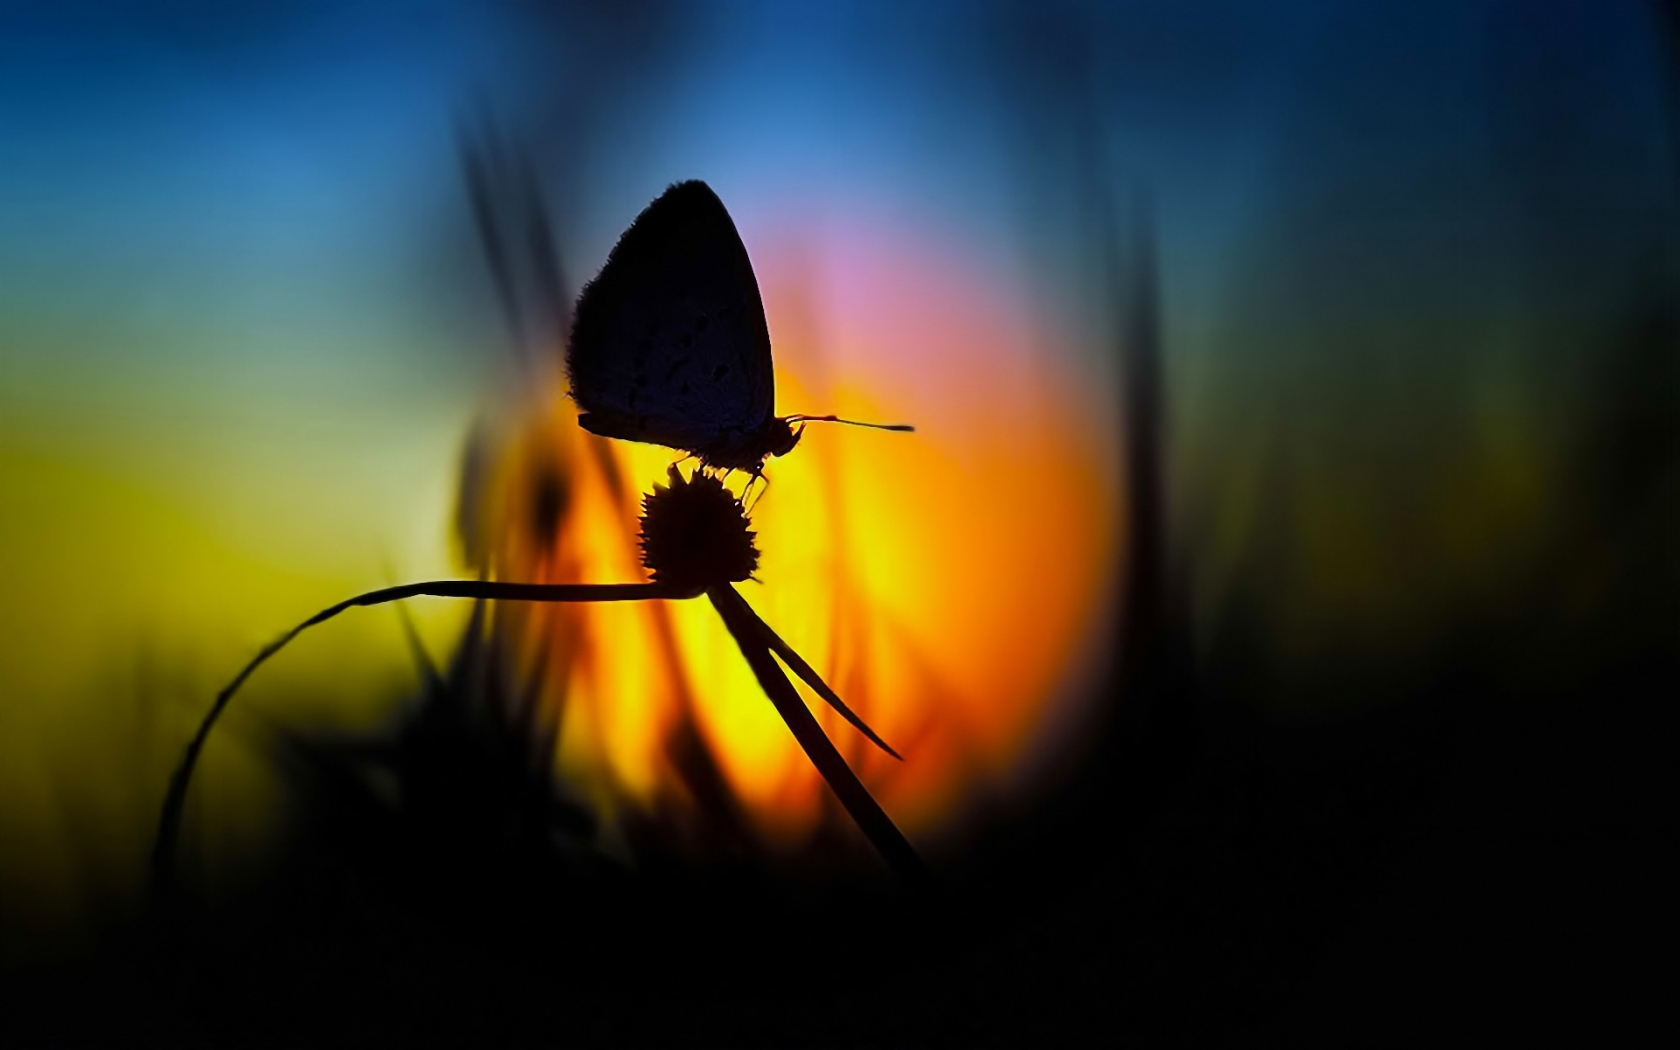 Foto de mariposa en contraluz - 1680x1050